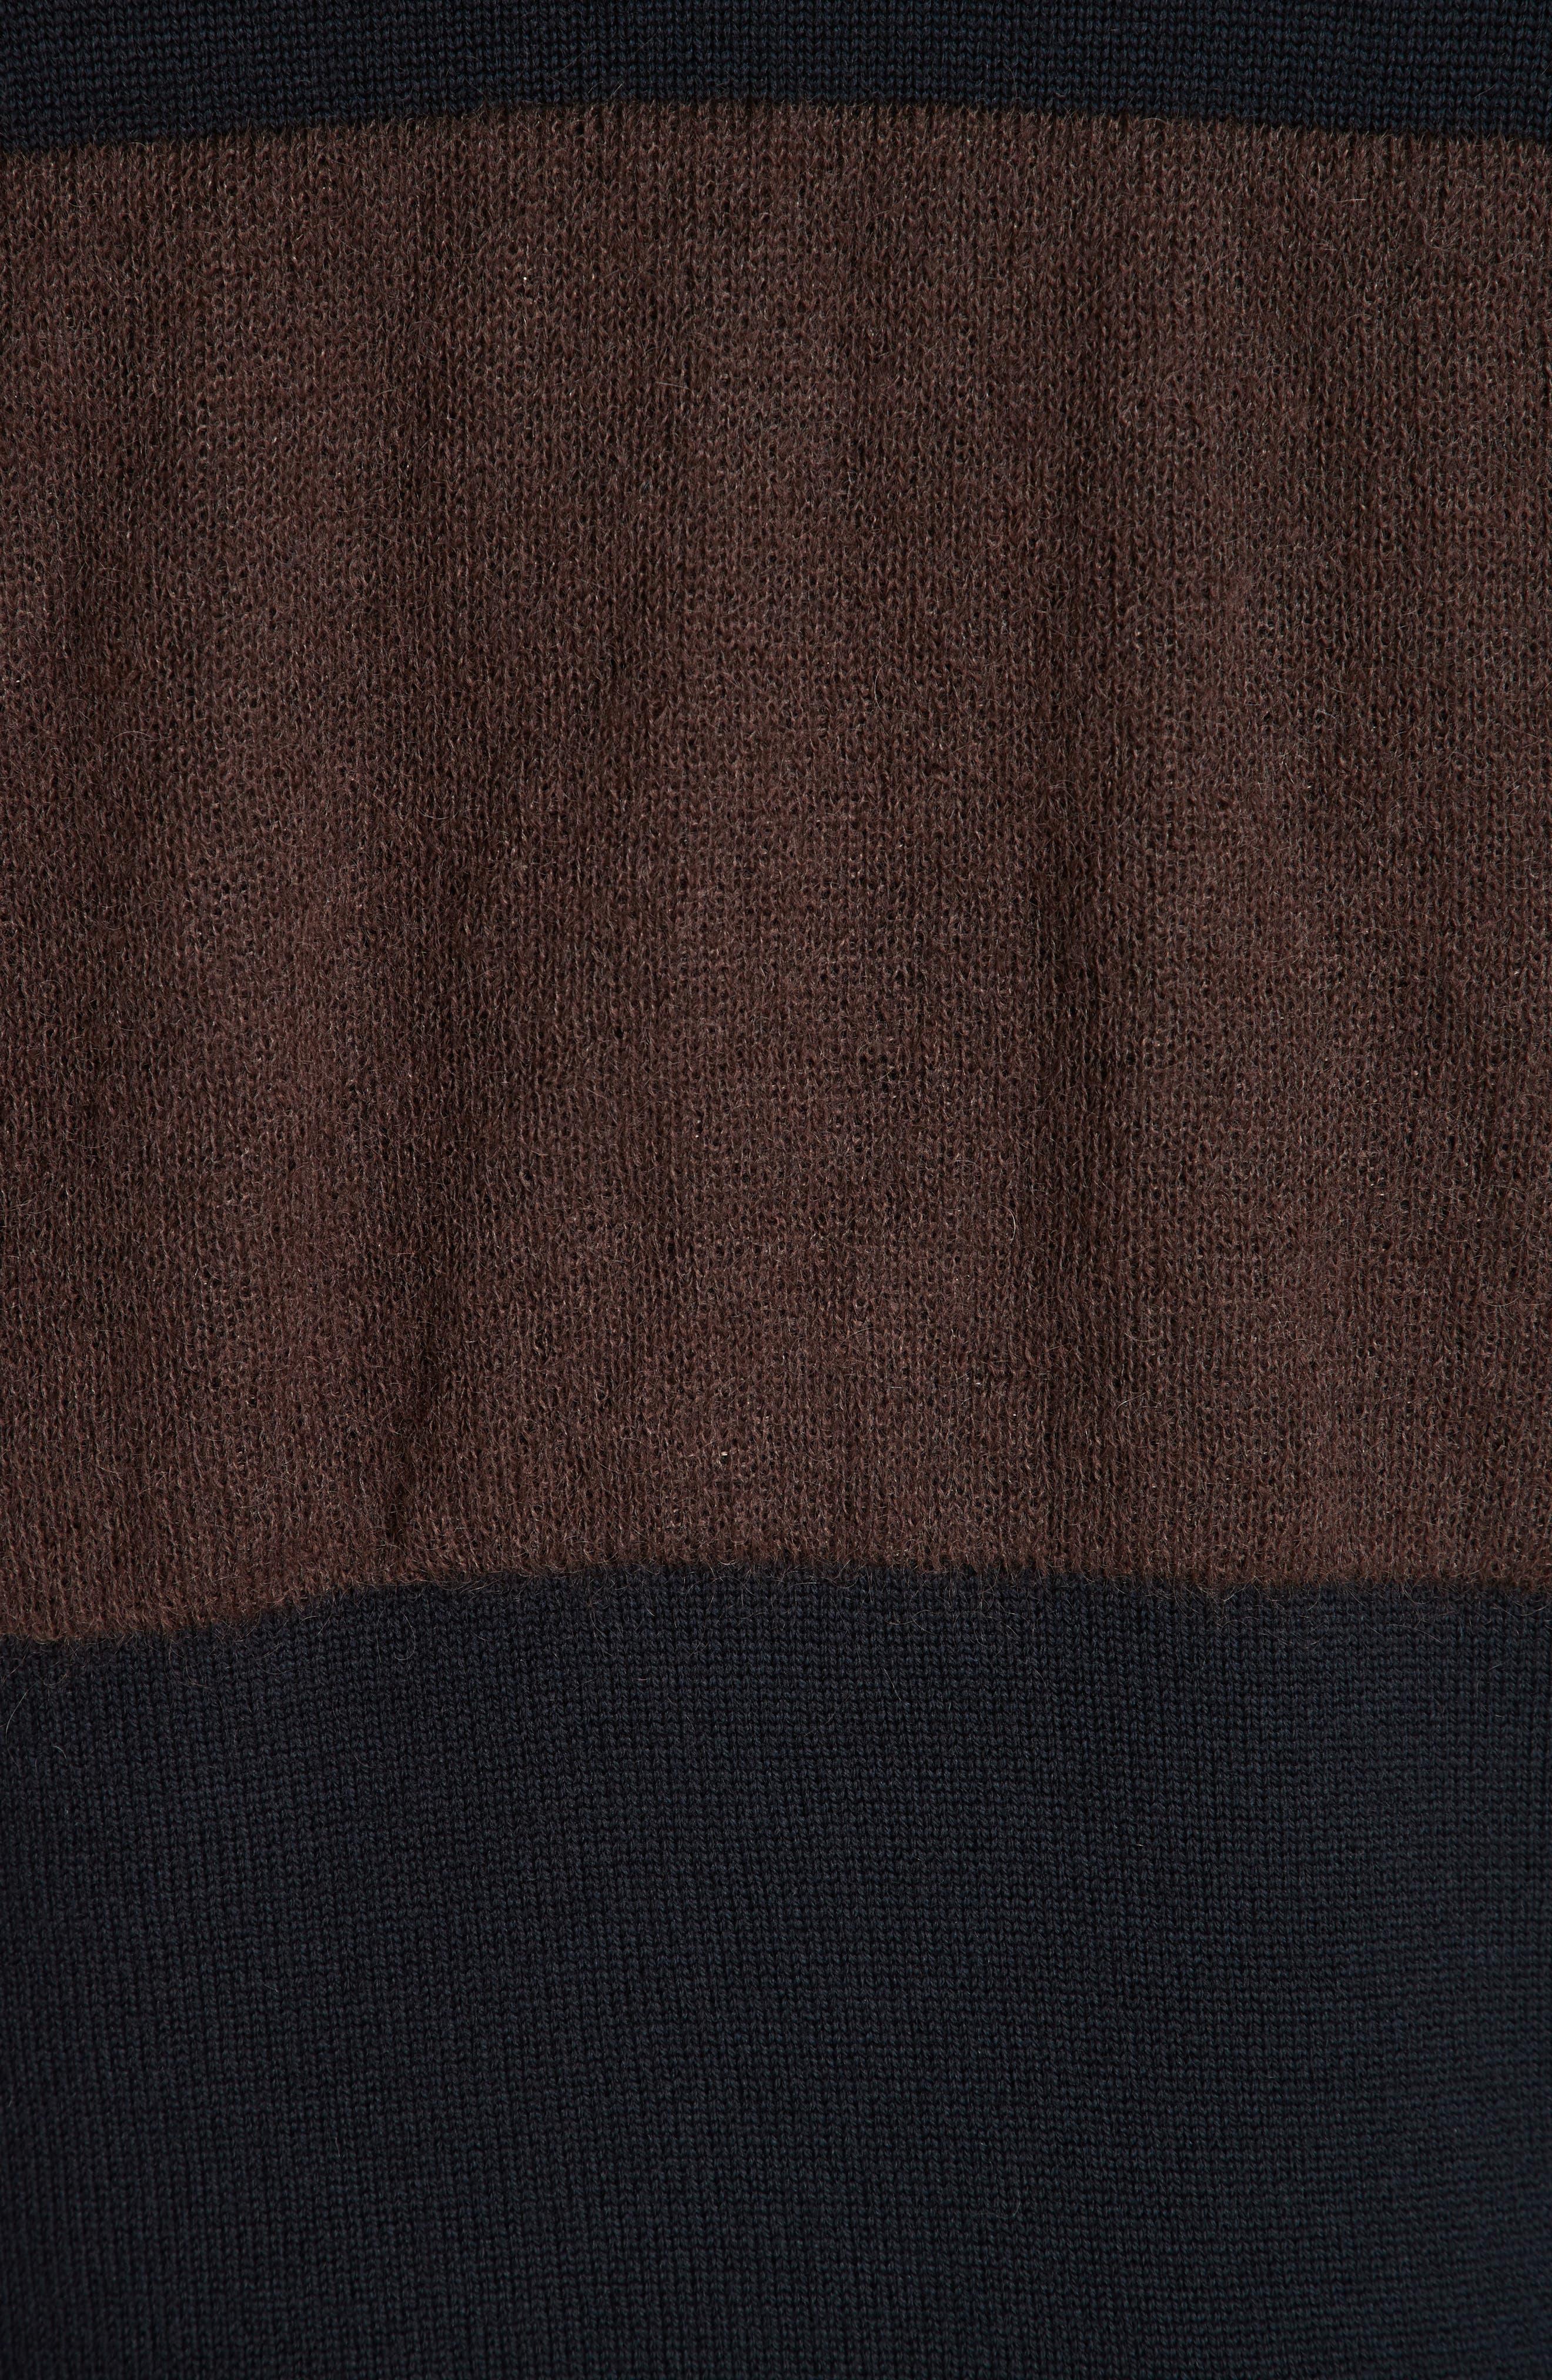 Stripe Sweater,                             Alternate thumbnail 5, color,                             NAVY